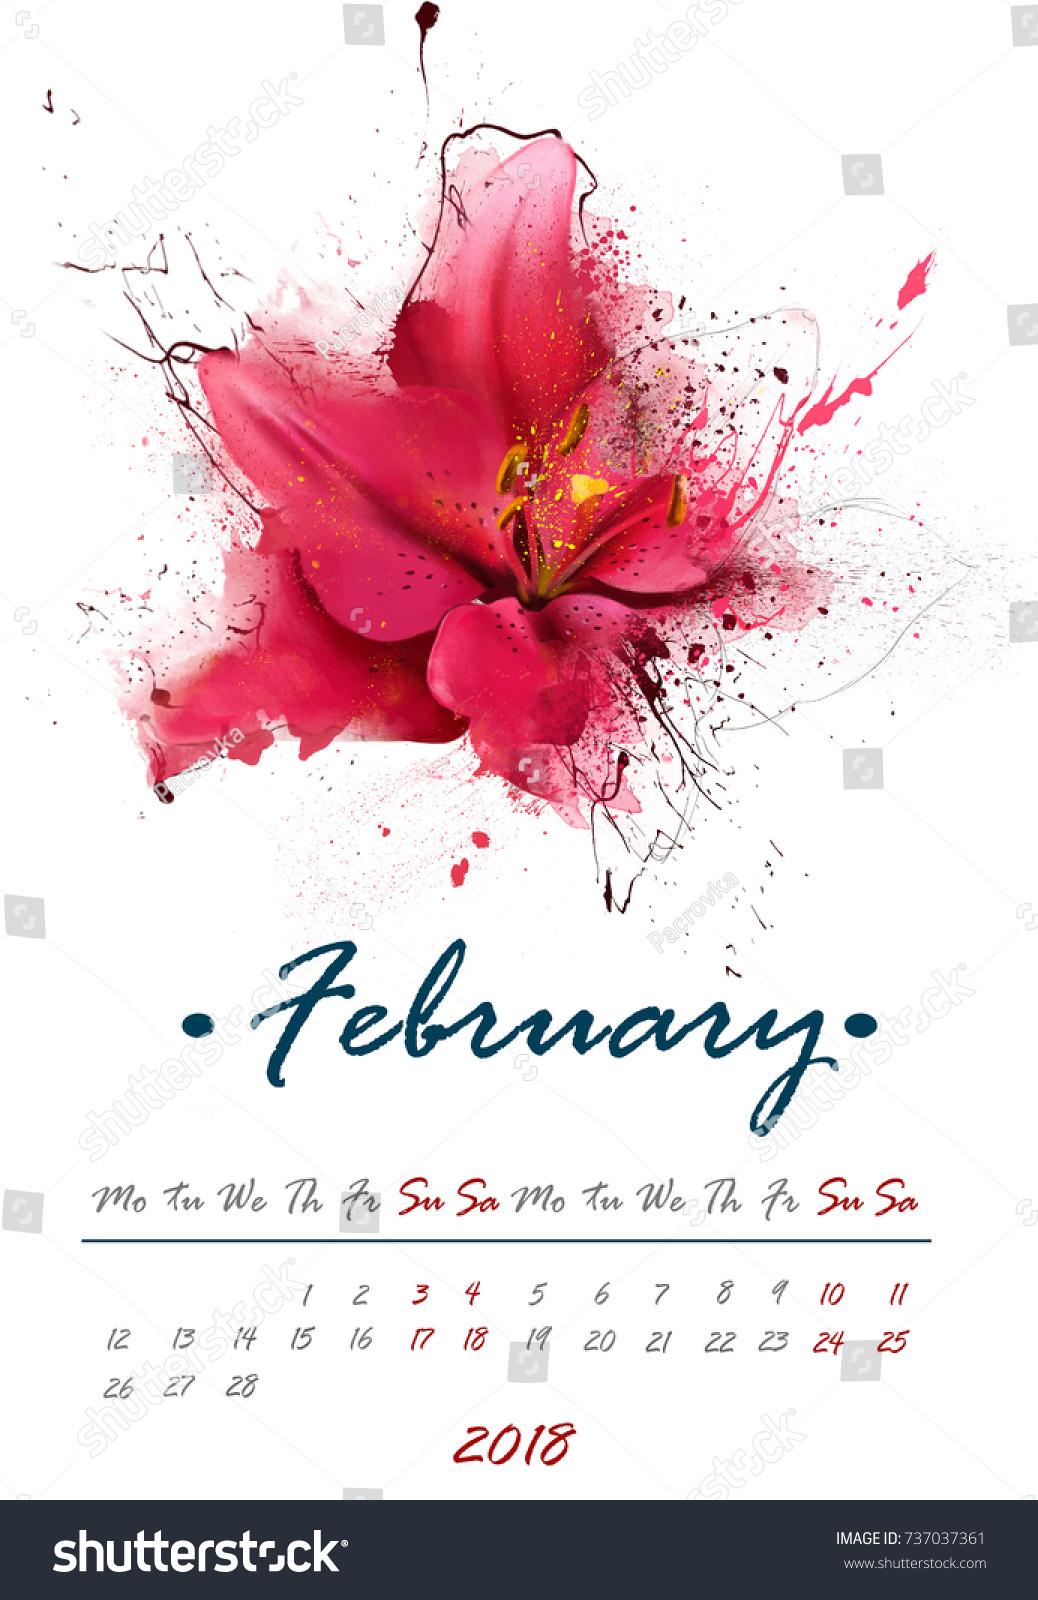 Birthday Flower Meaning Gallery Flower Wallpaper Hd